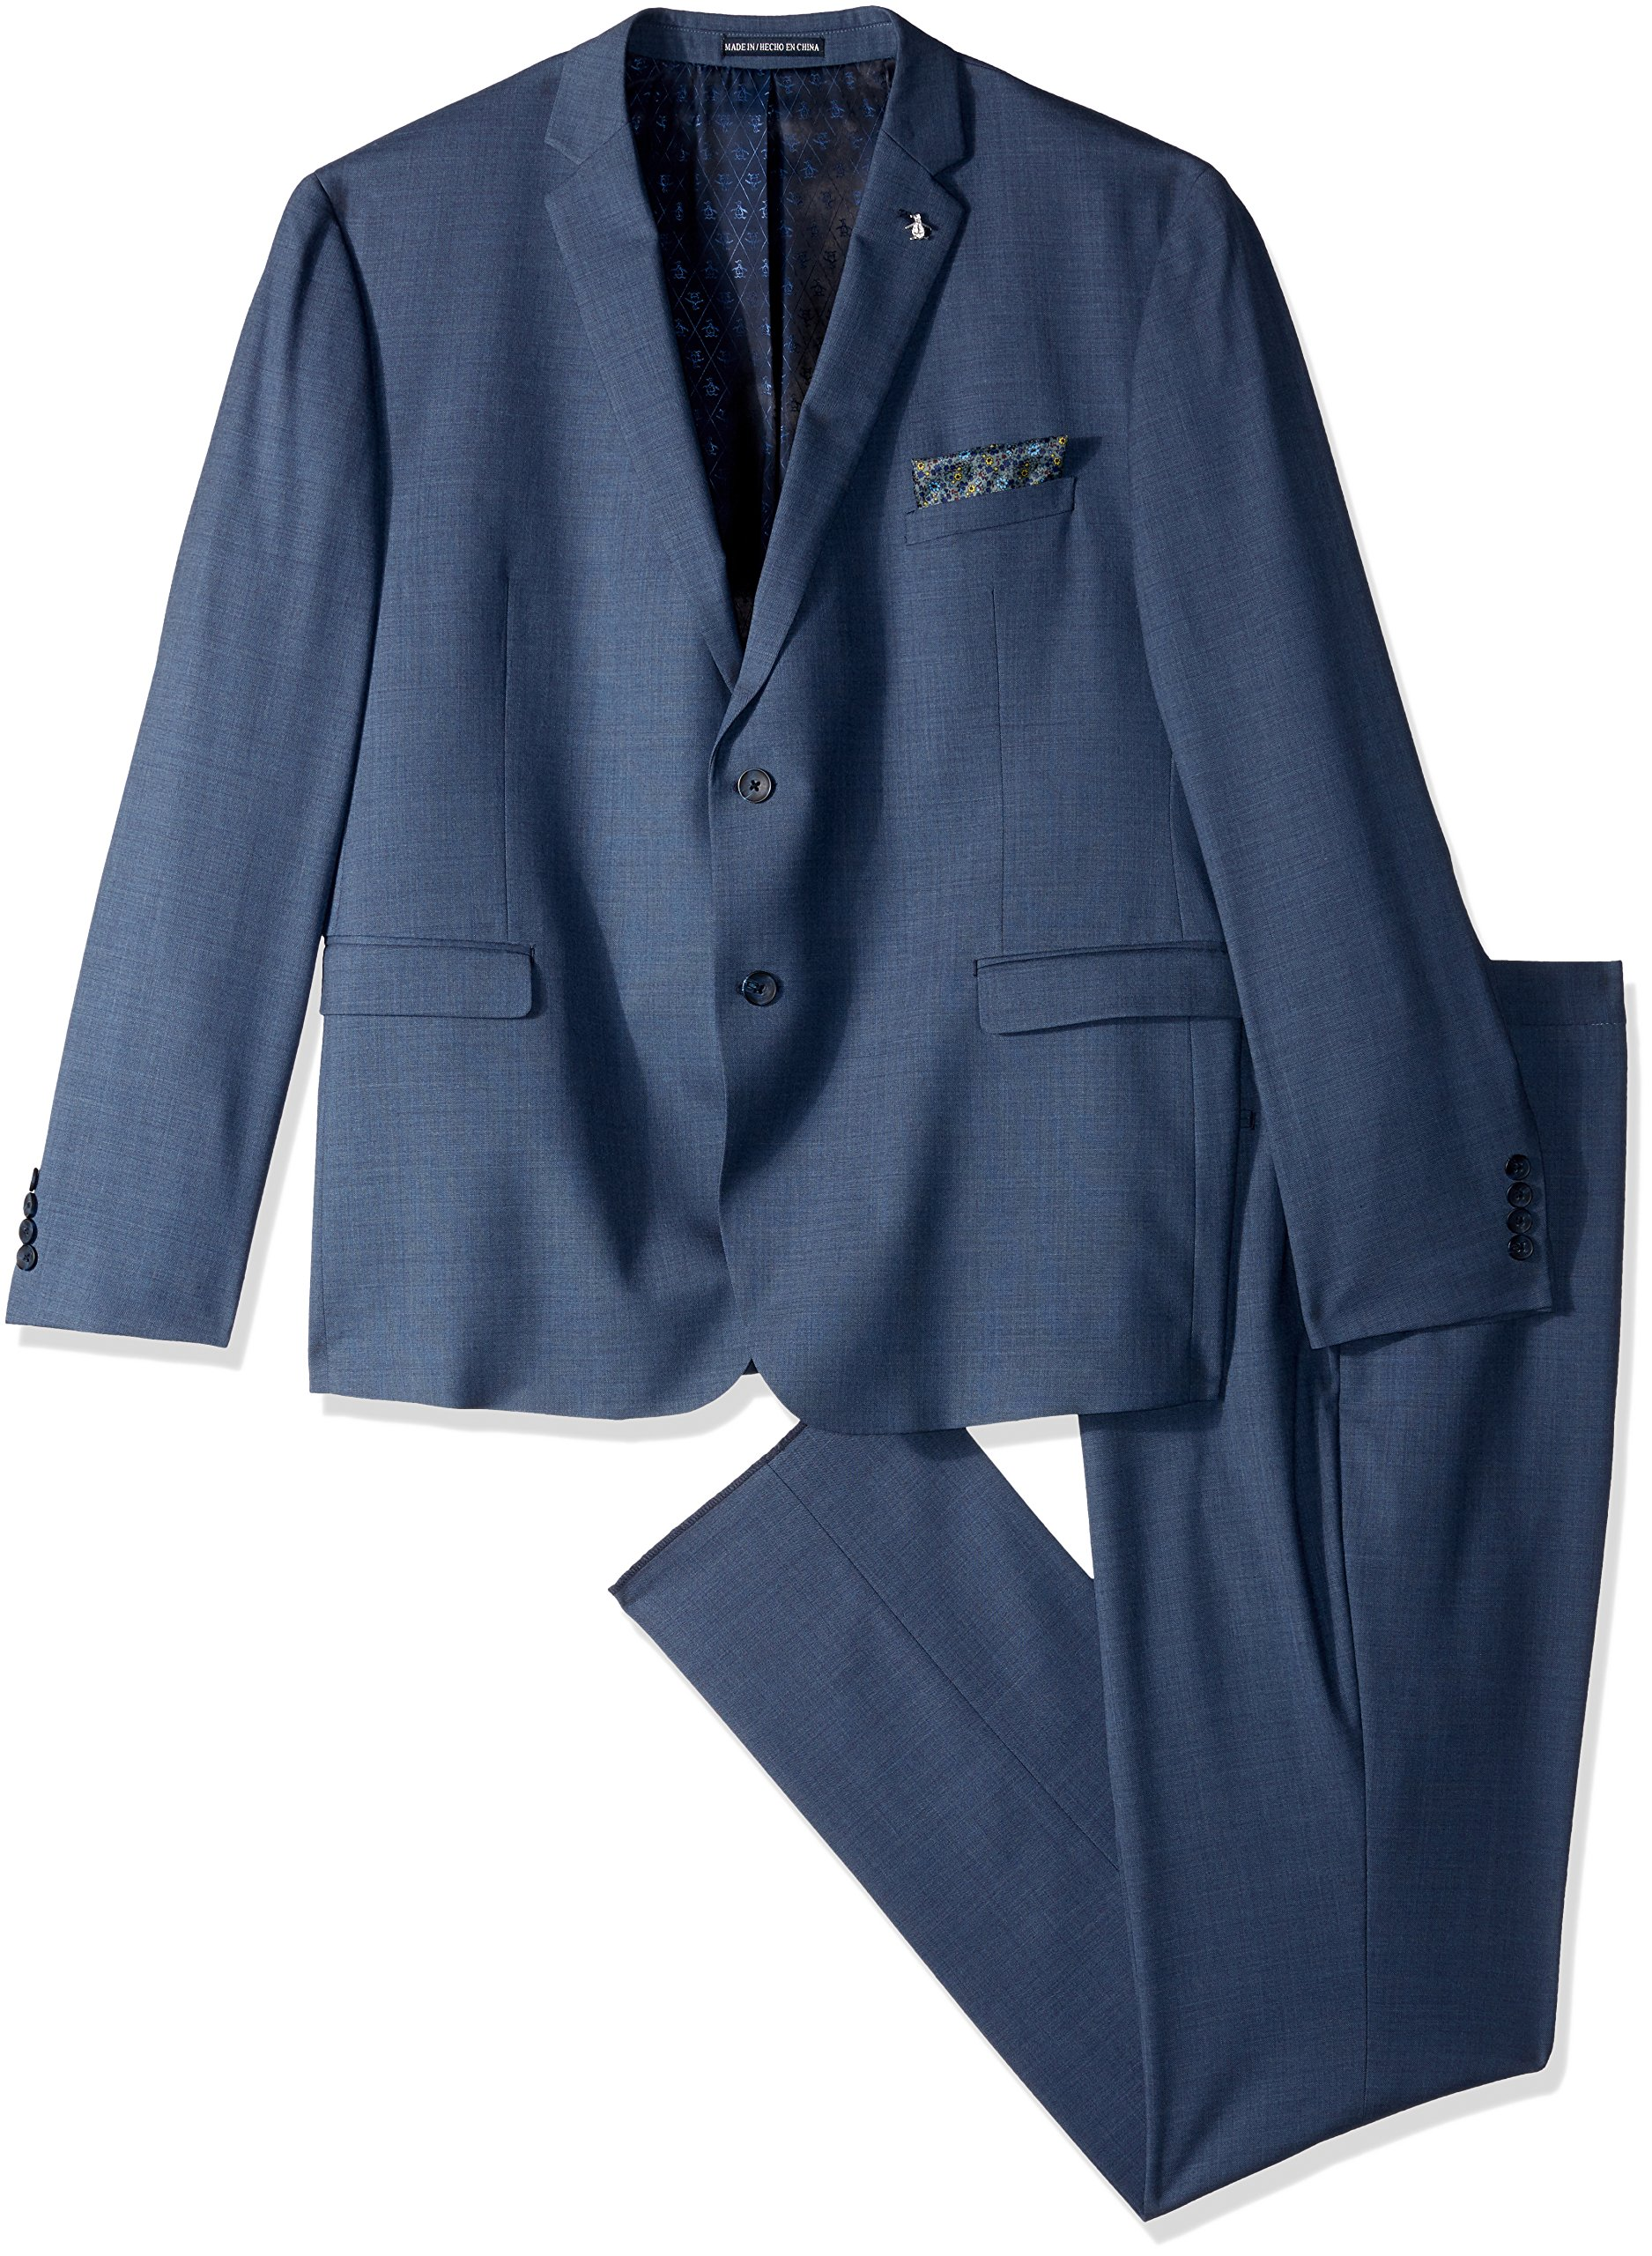 Original Penguin Men's Slim Fit Suit, Blue Sharkskin, 42REG